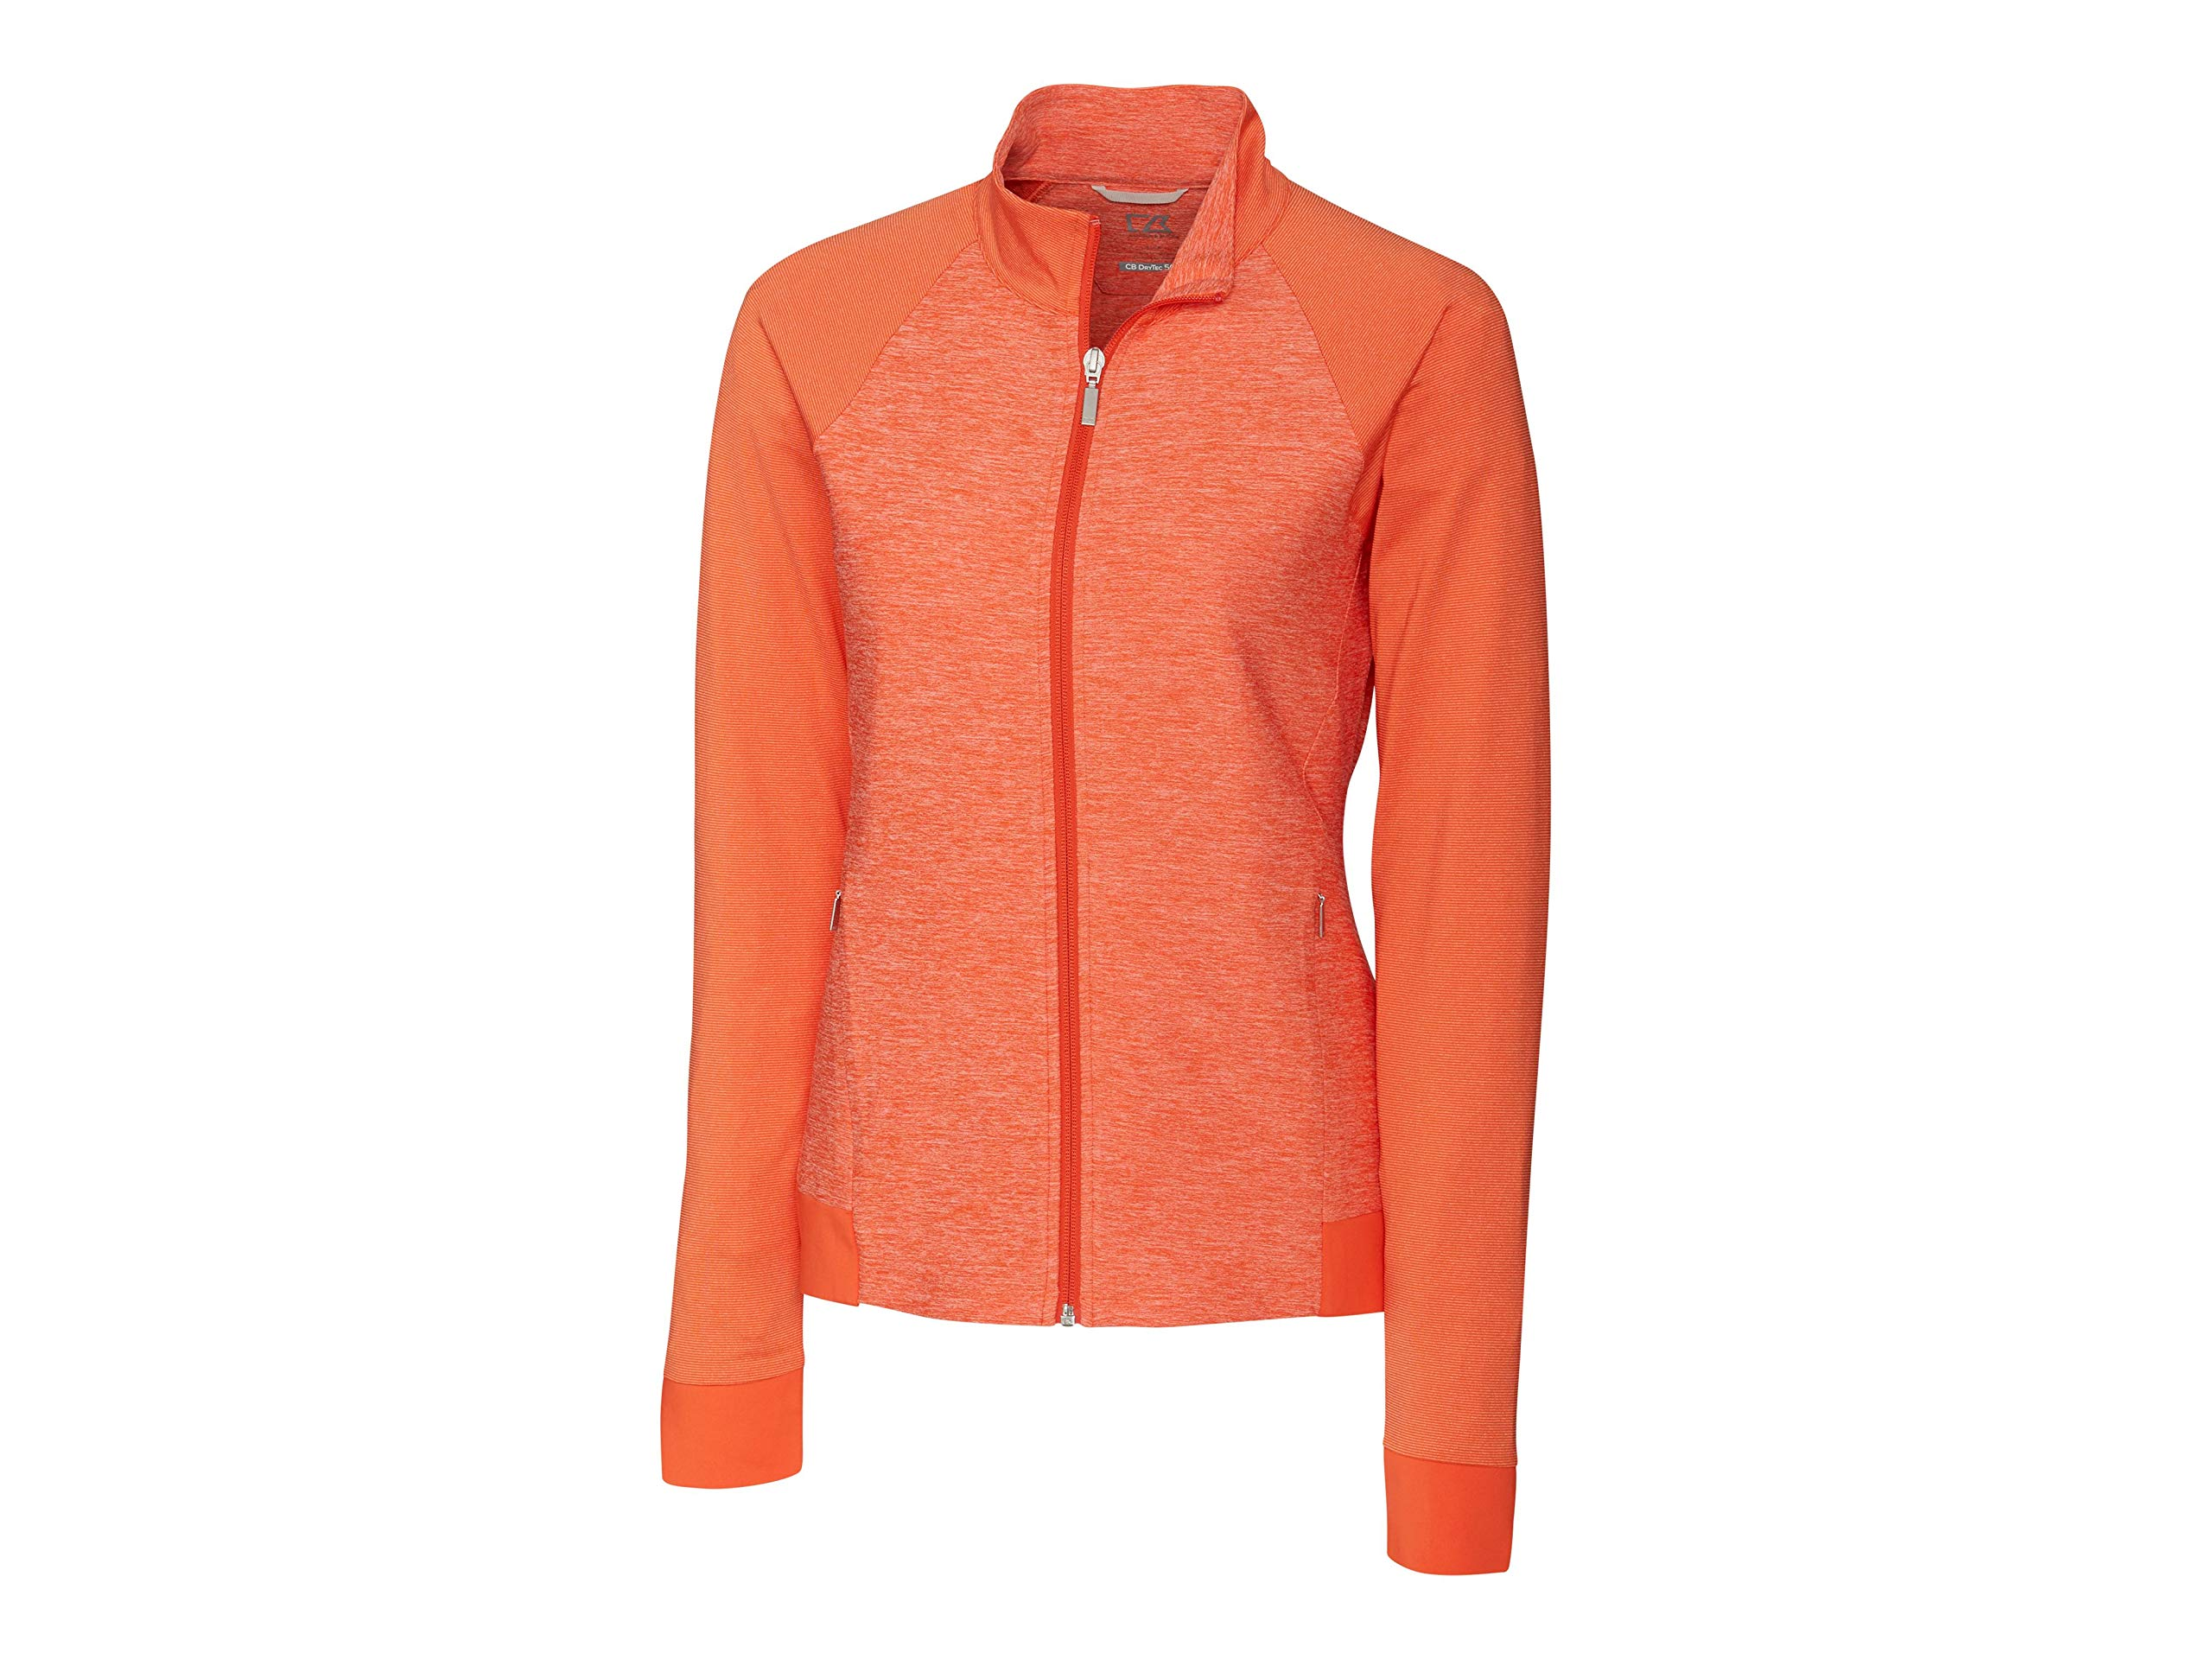 Cutter & Buck LCK08688 Women's L/S Lena Full Zip Jacket, College Orange - XS